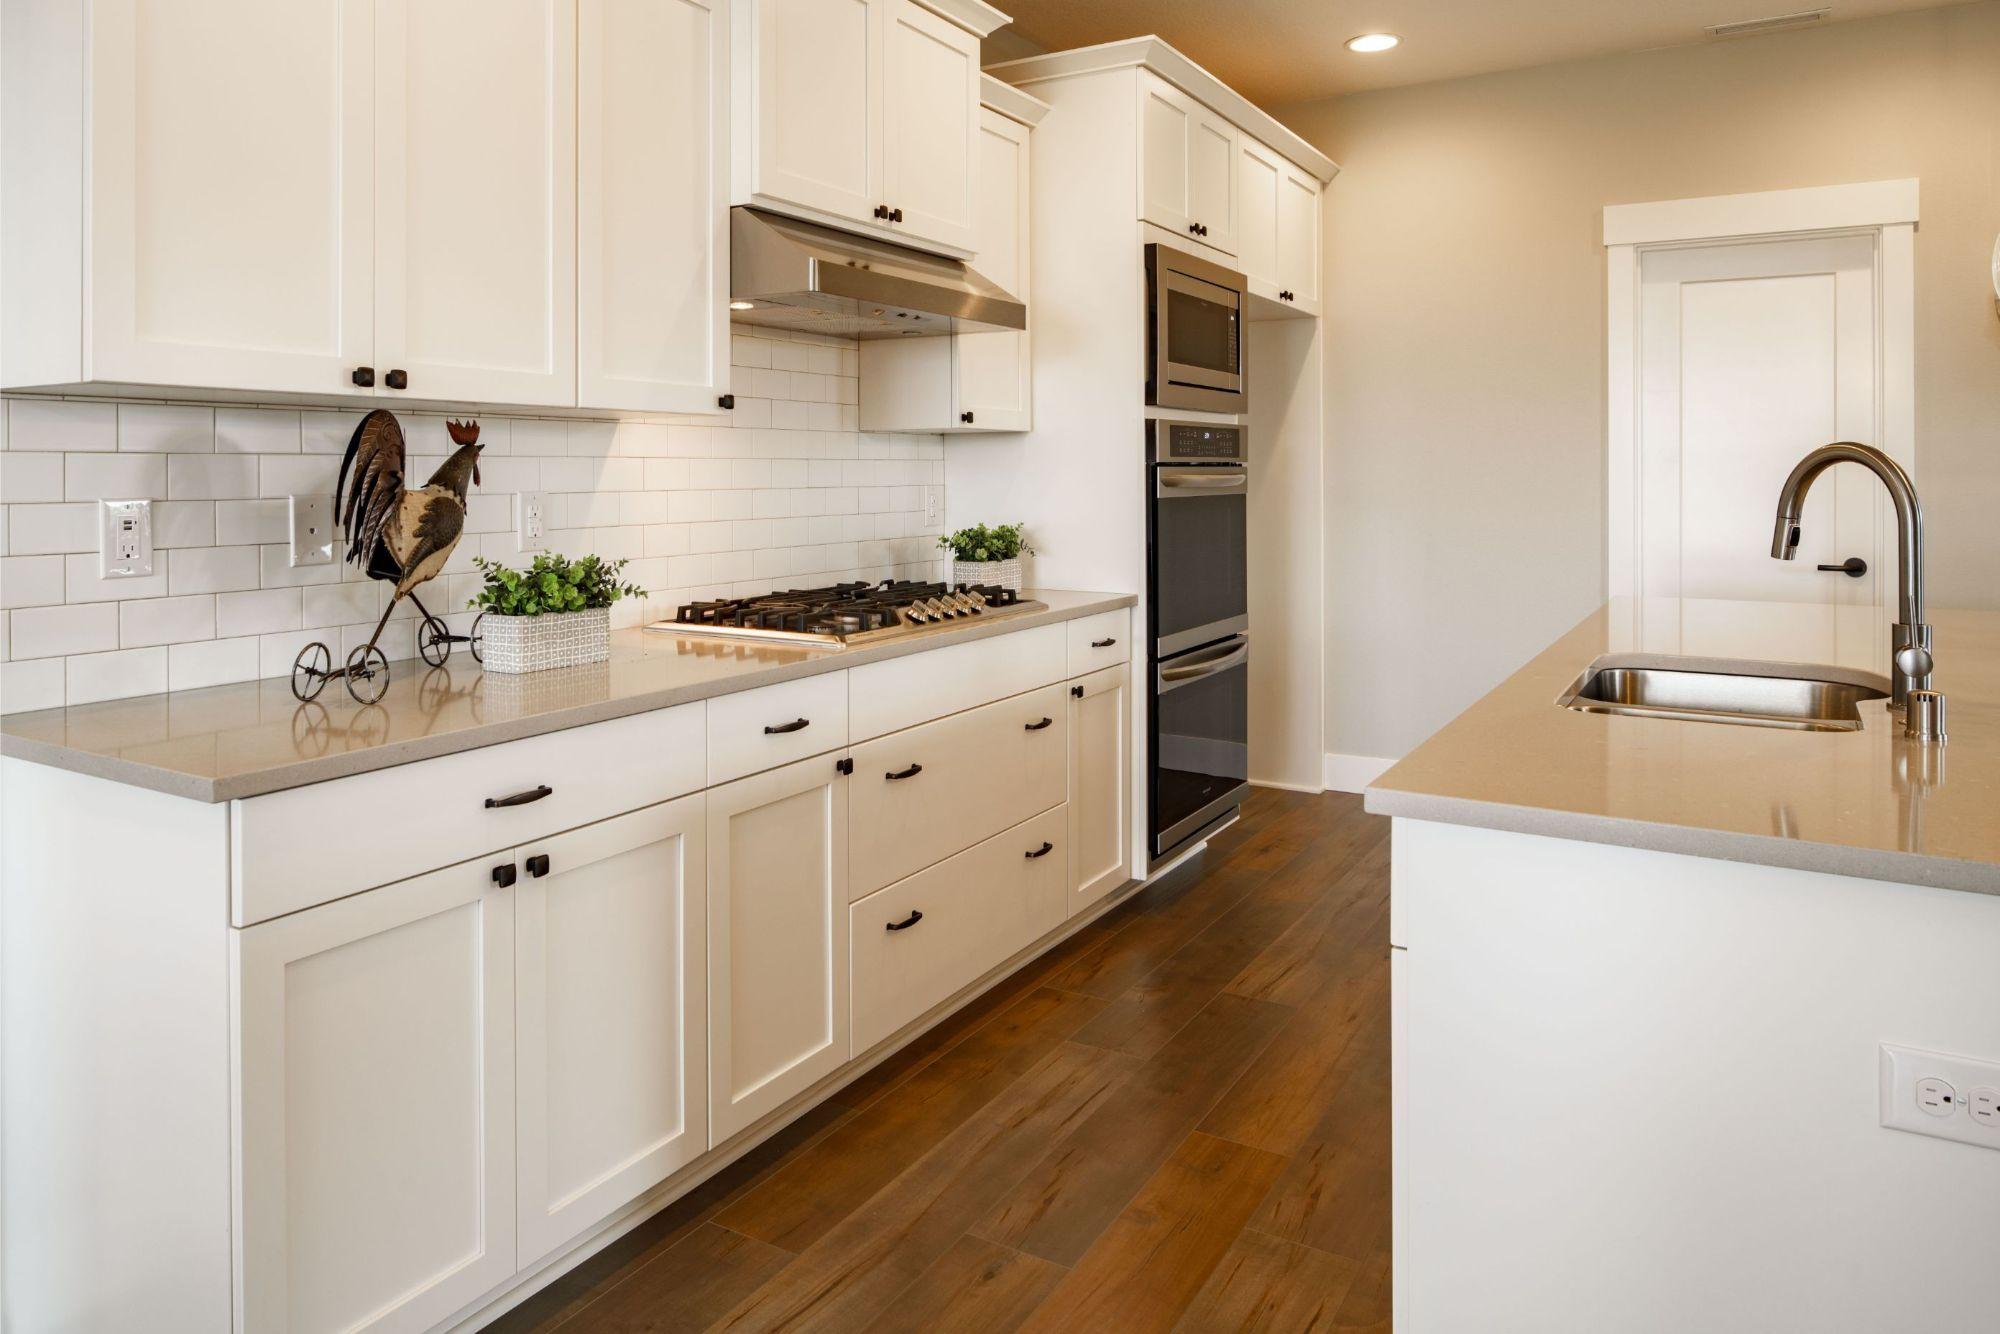 10++ Teton kitchen ideas